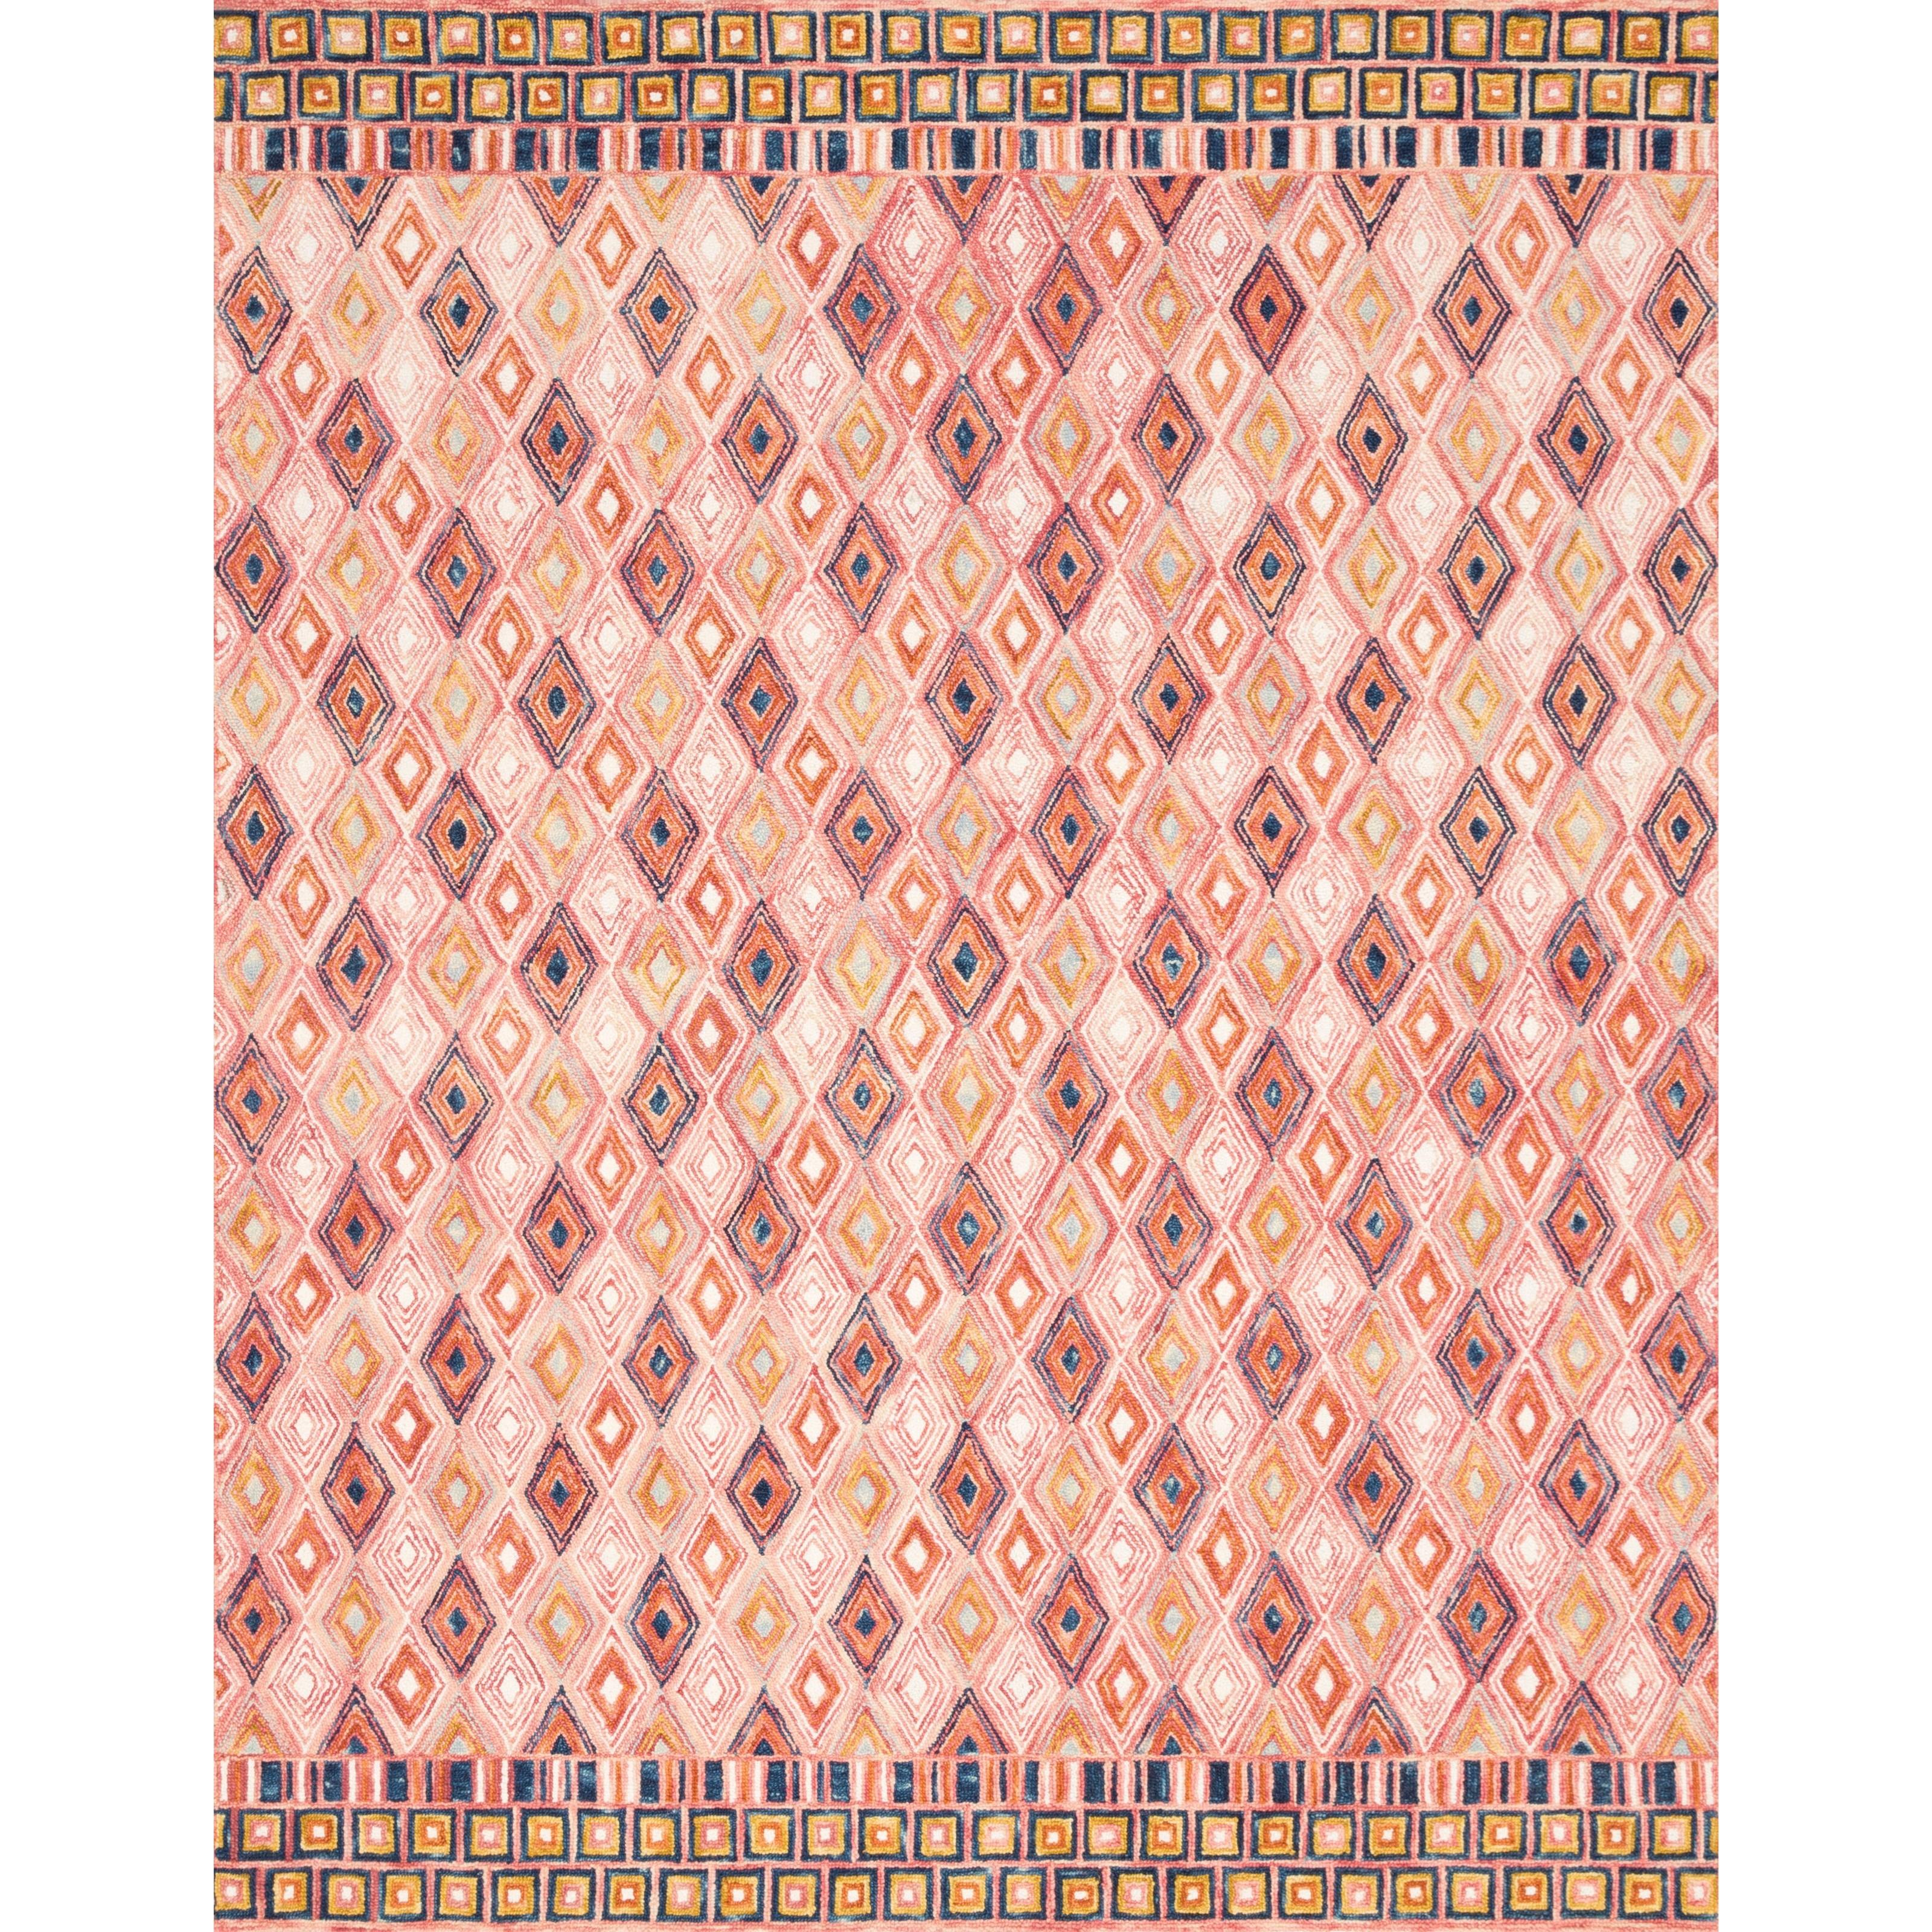 "Priti 5'0"" x 7'6"" Pink / Sunset Rug by Loloi Rugs at Virginia Furniture Market"